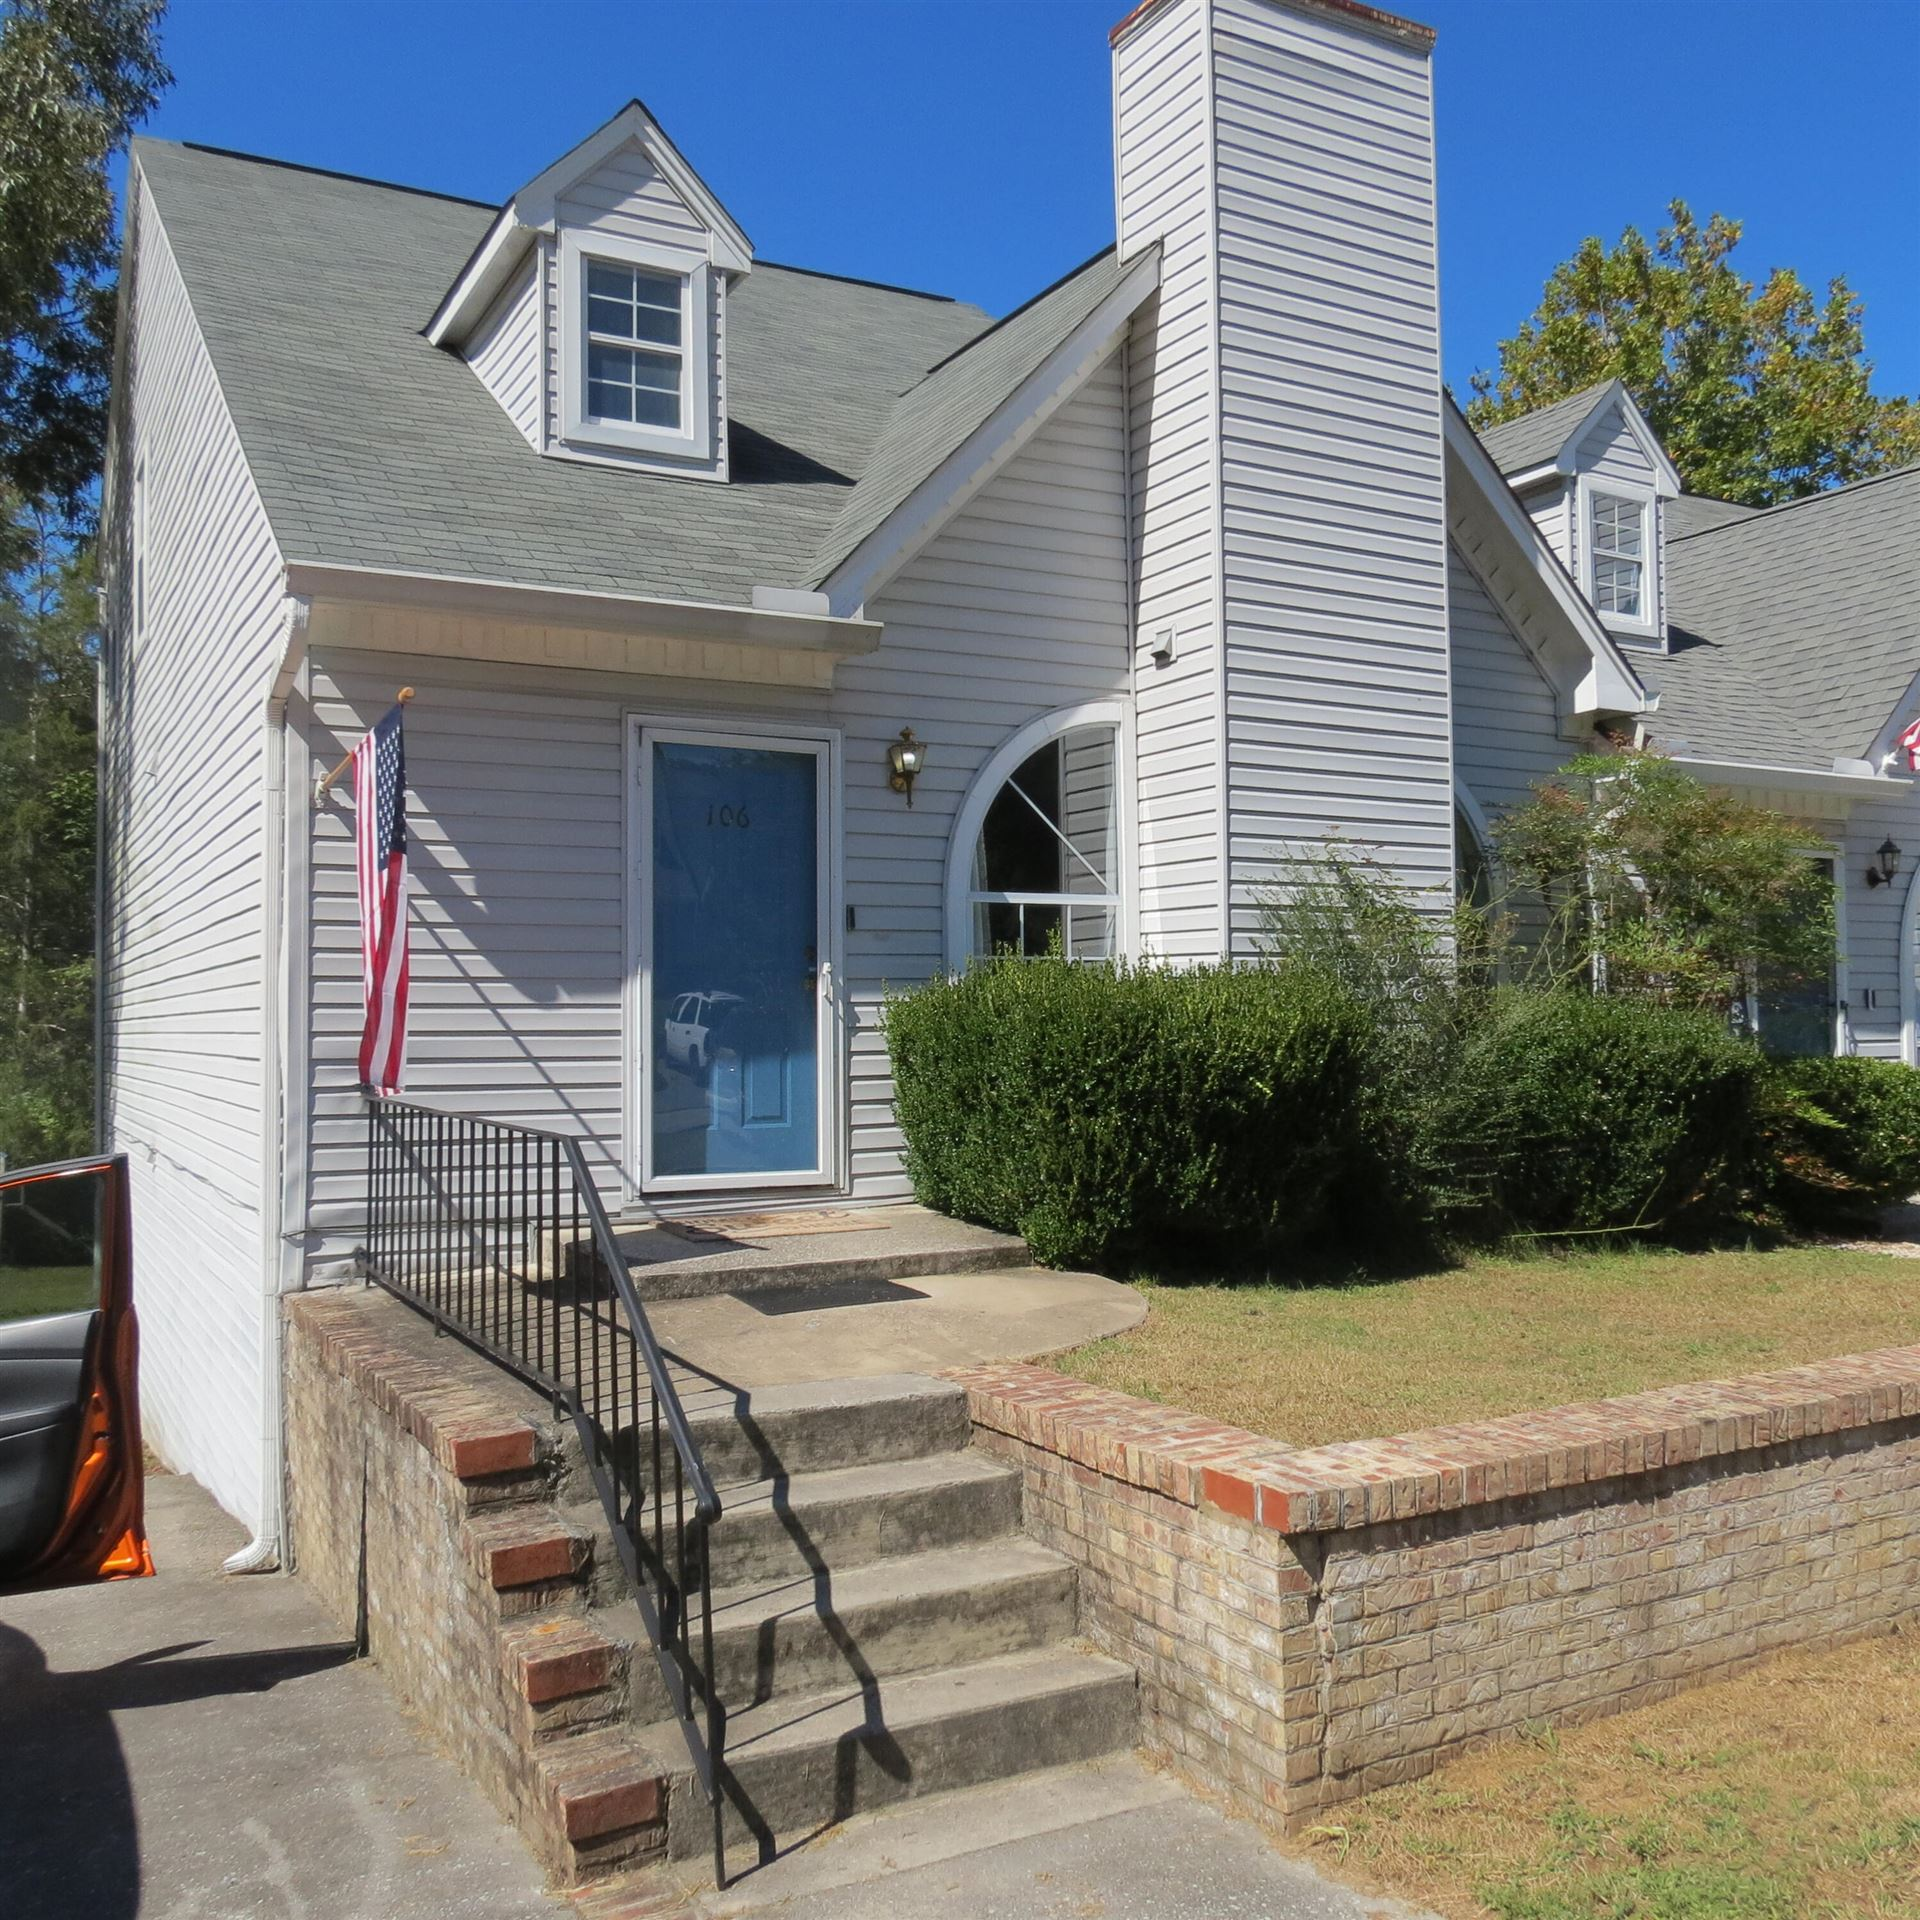 Photo of 106 Hanover Place, Oak Ridge, TN 37830 (MLS # 1168915)